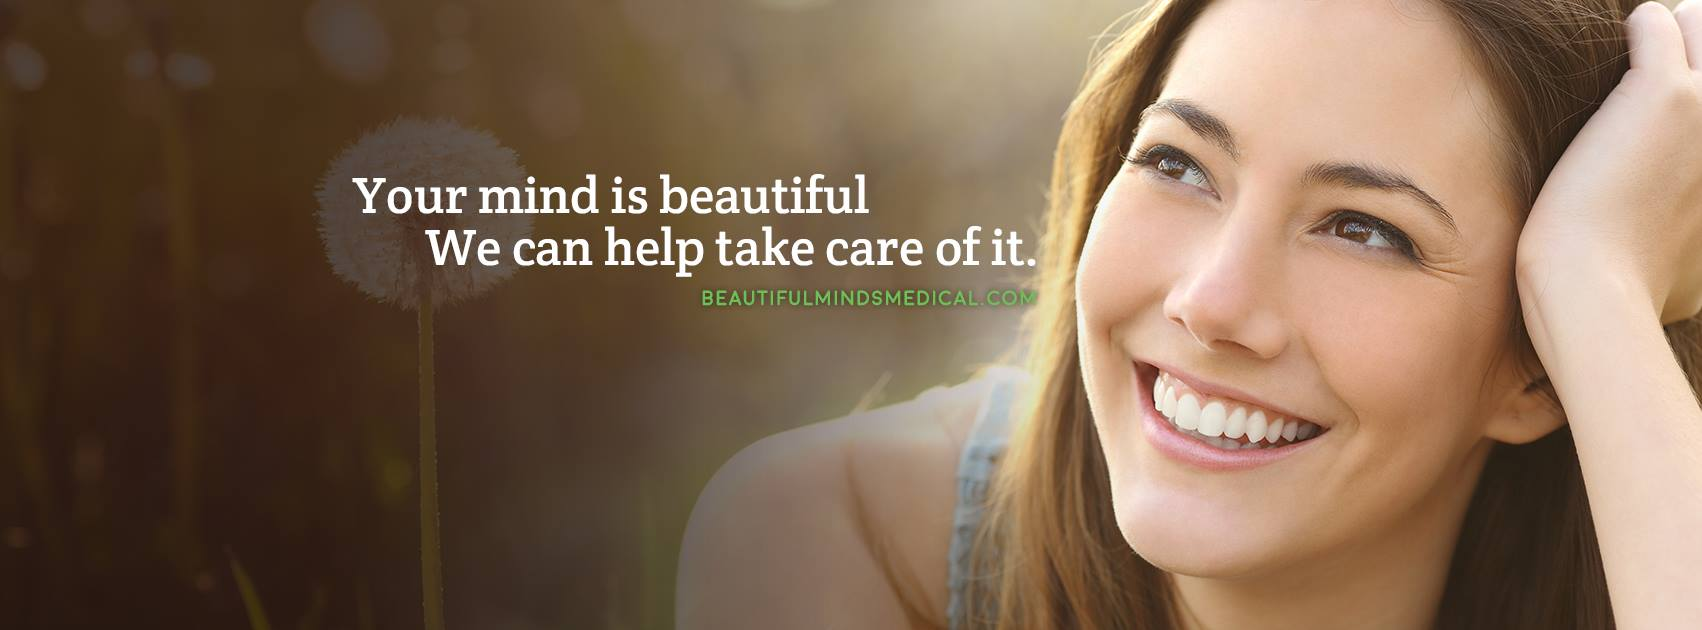 Beautiful Minds Medical, Inc. - Mental Health Care